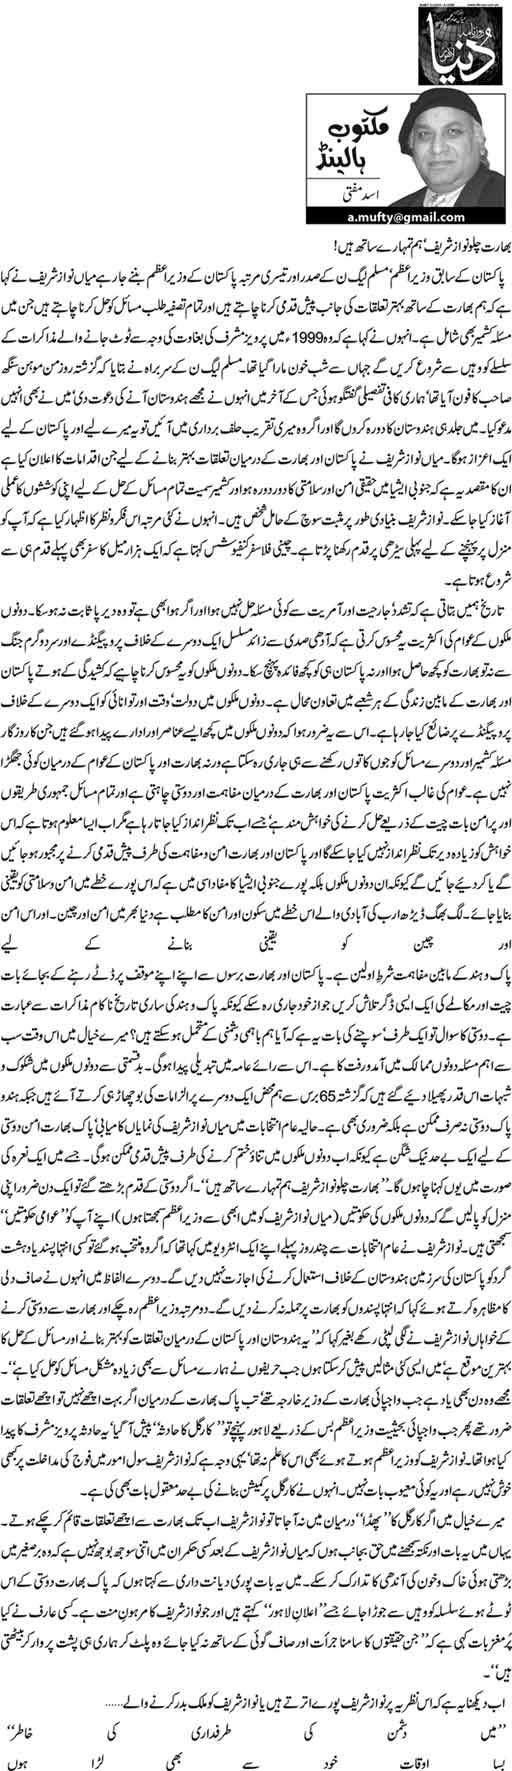 asad mufti2 Bharat Chalo Nawaz Sharif, Hum Tumharay Sath Hain by Asad Mufti